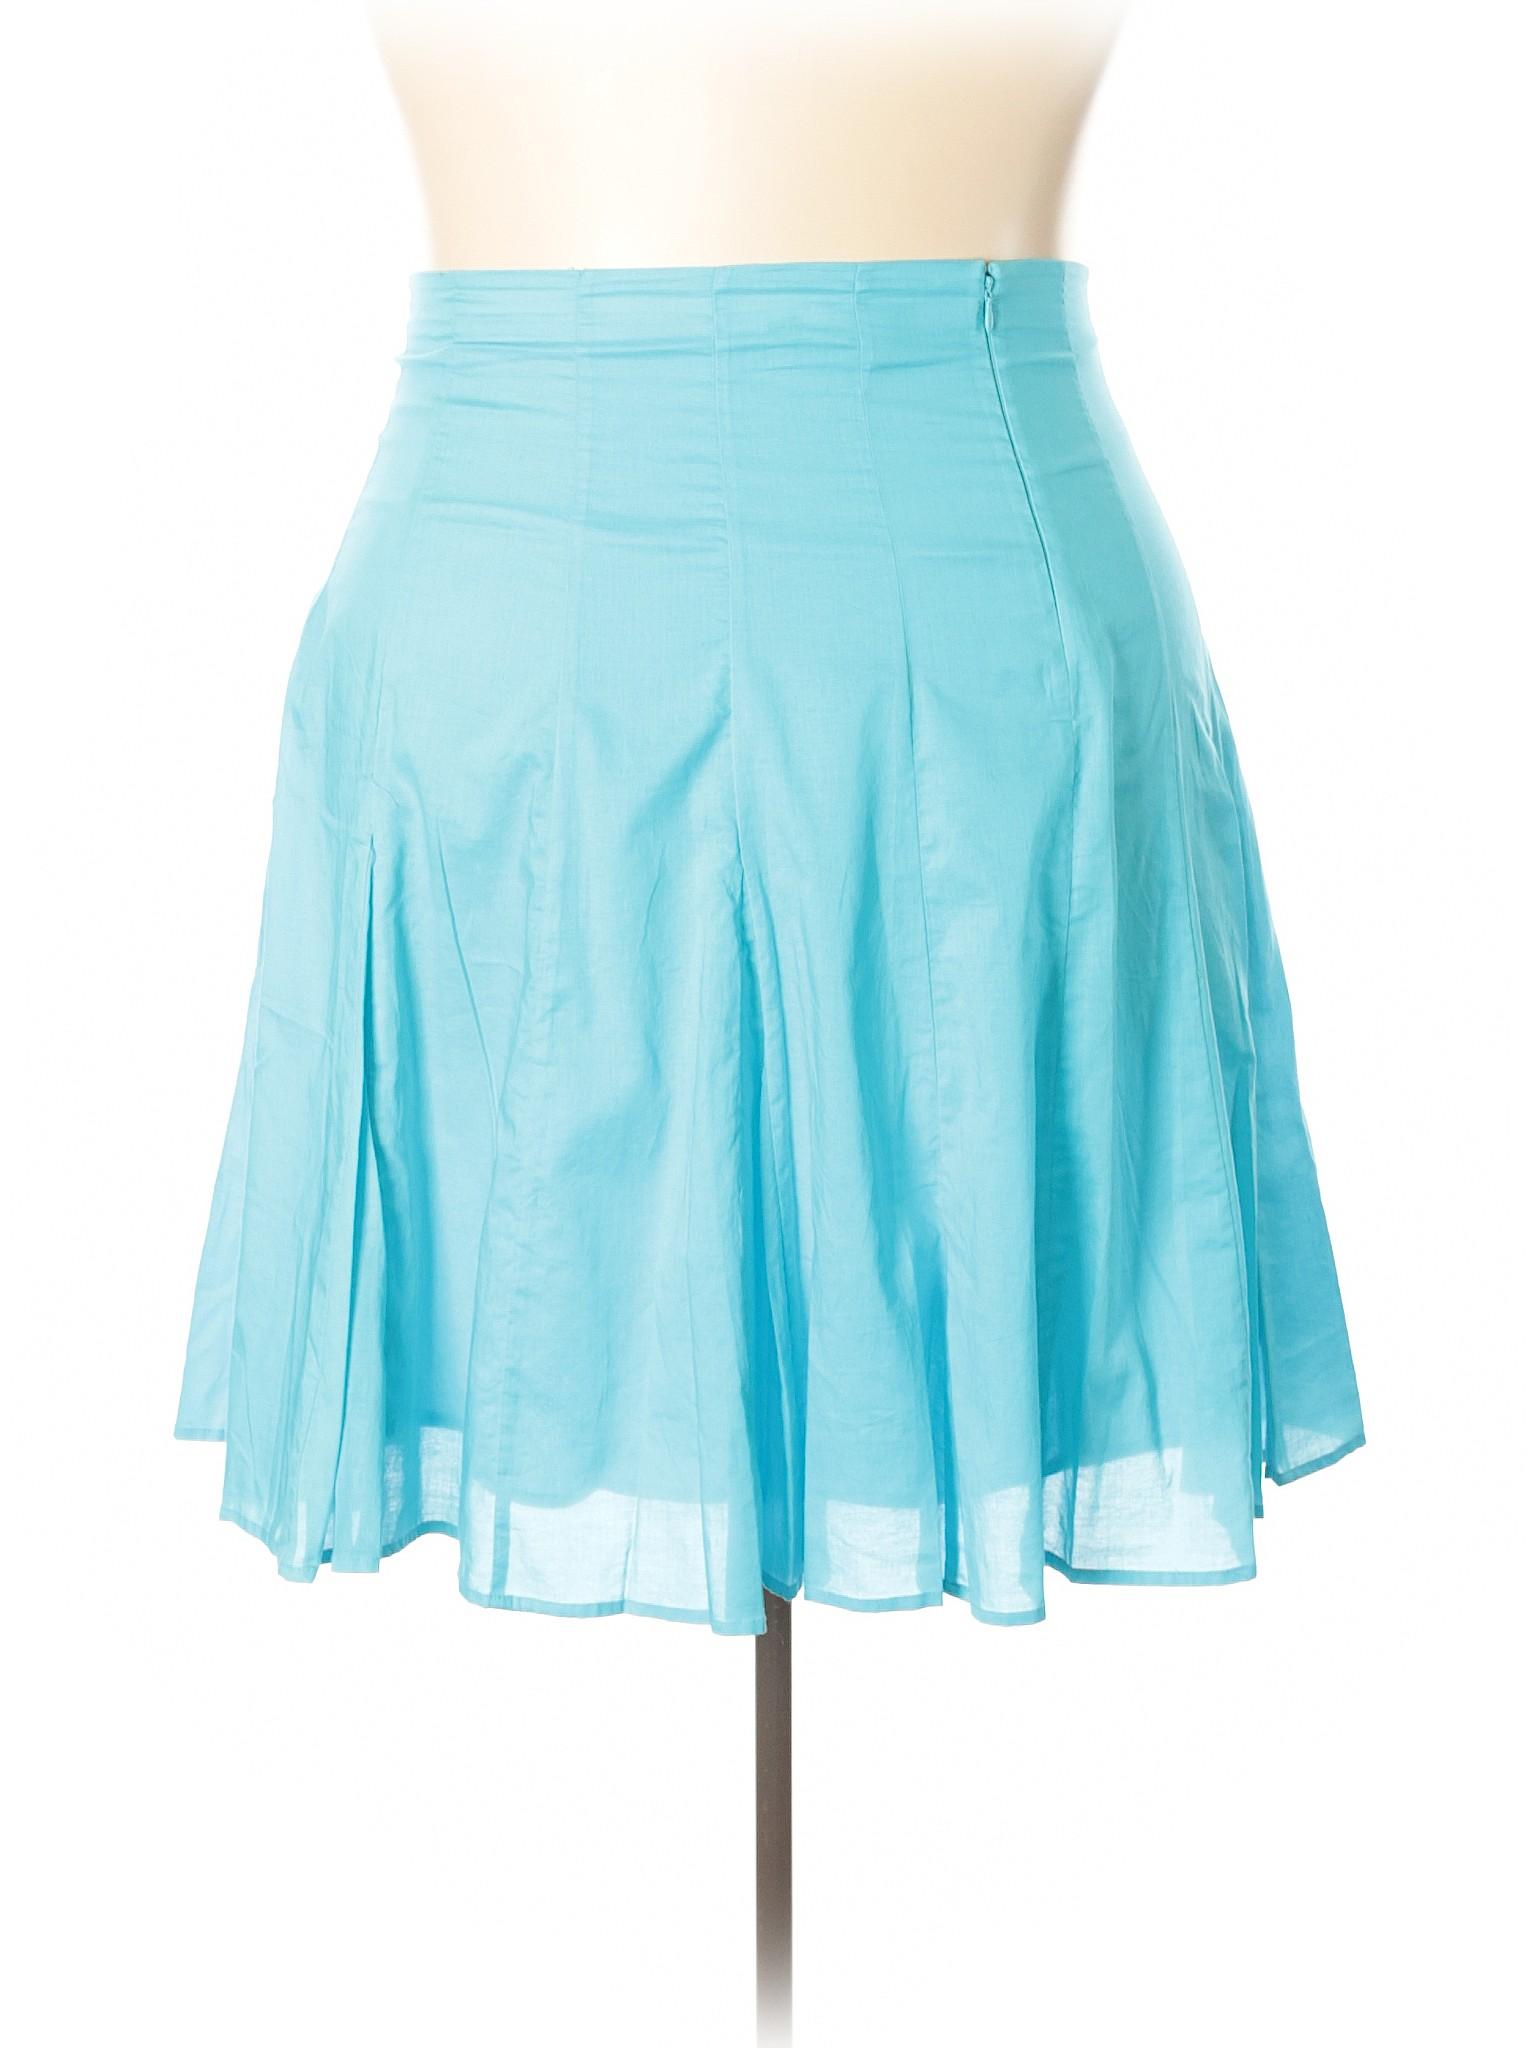 Casual Skirt Boutique Boutique Casual RWfEFPR4